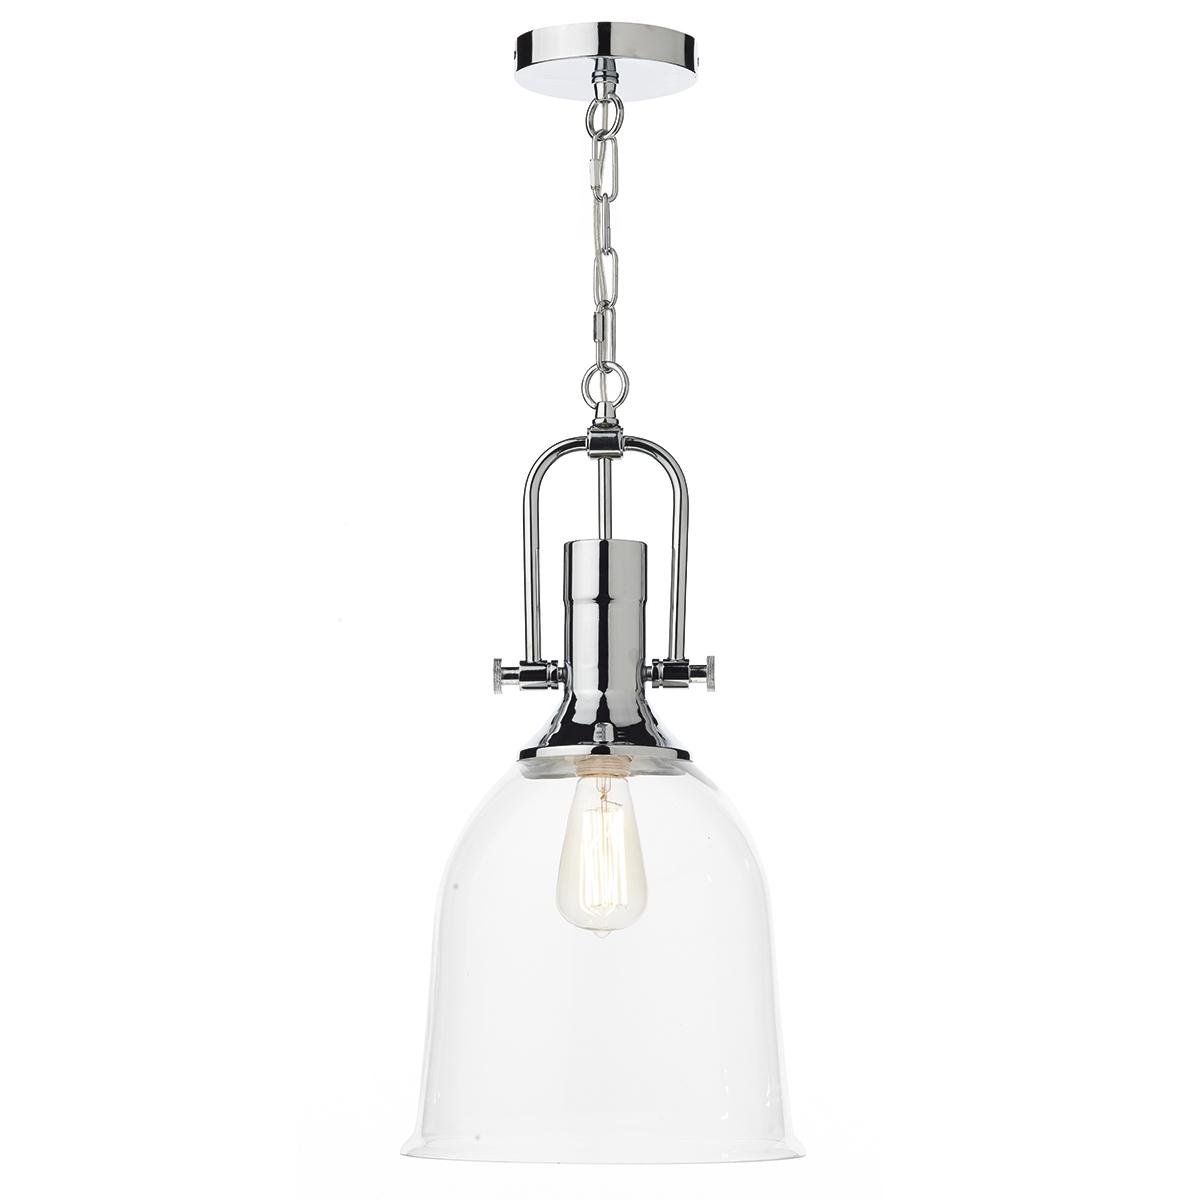 Midwest Lighting Ltd :: Pendants :: Nolan Pendant Inside Preferred Nolan 1 Light Single Cylinder Pendants (View 6 of 25)